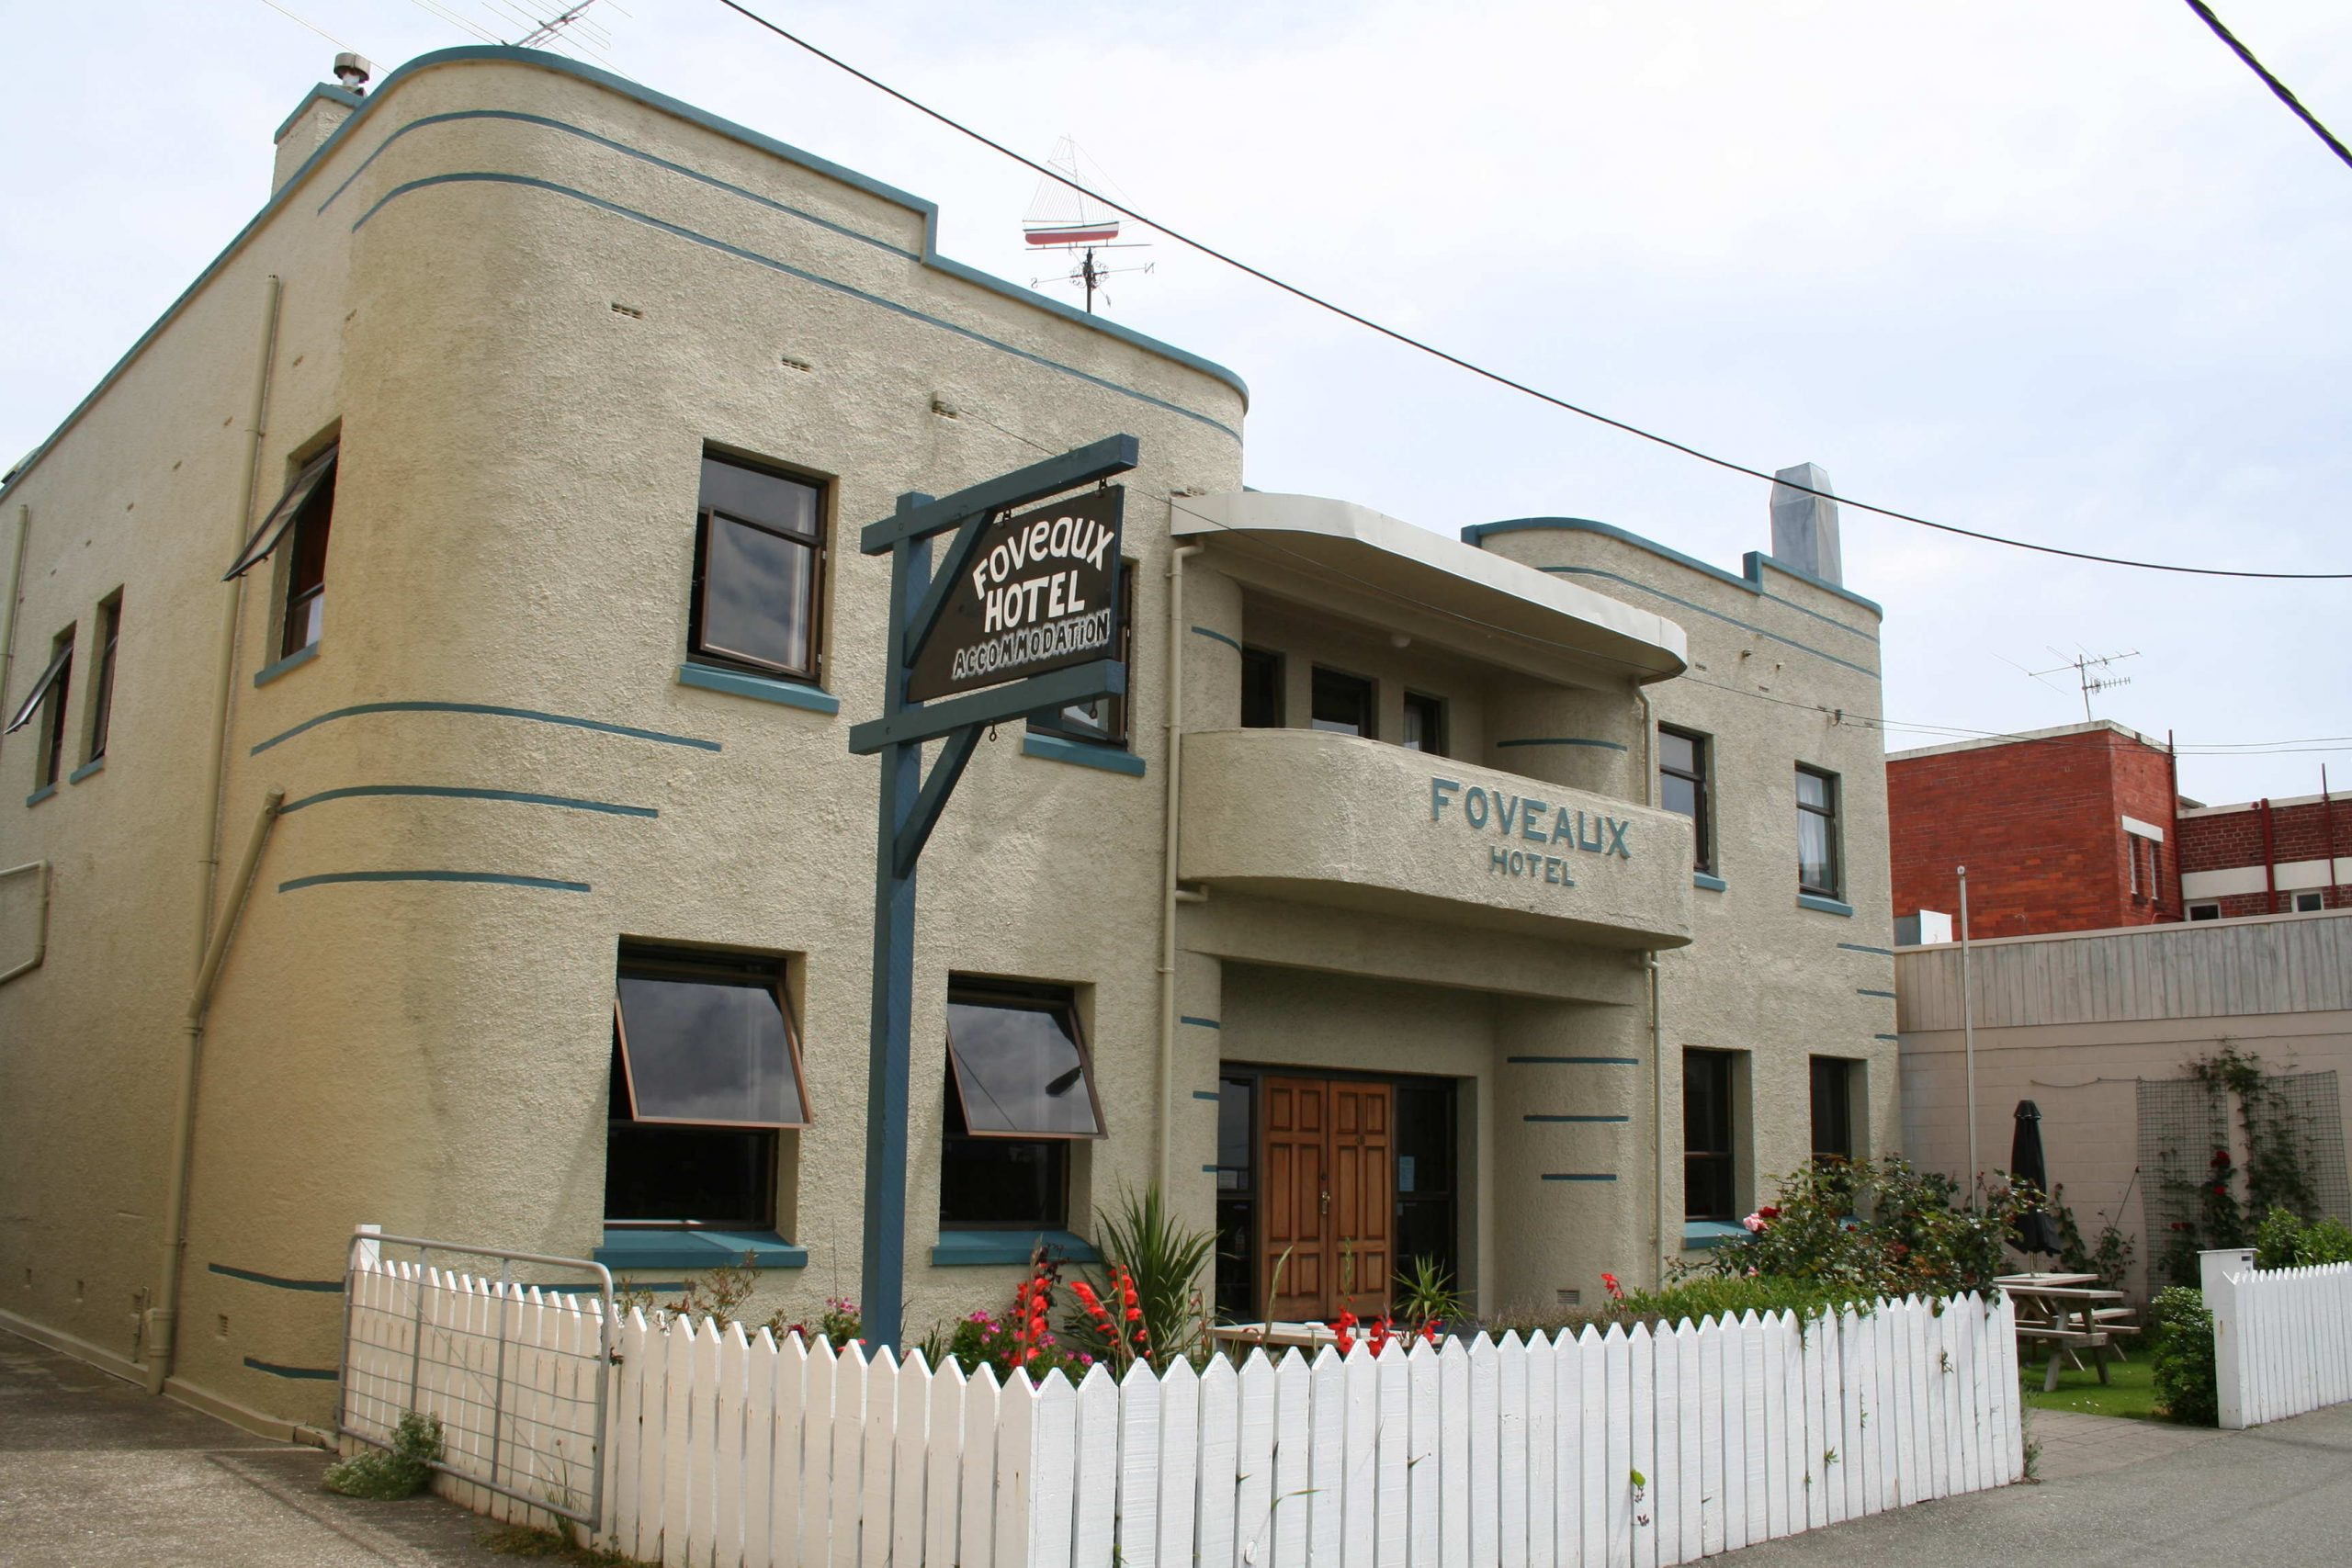 Foveaux Hotel, Bluff,New Zealand @Southland, New Zealand